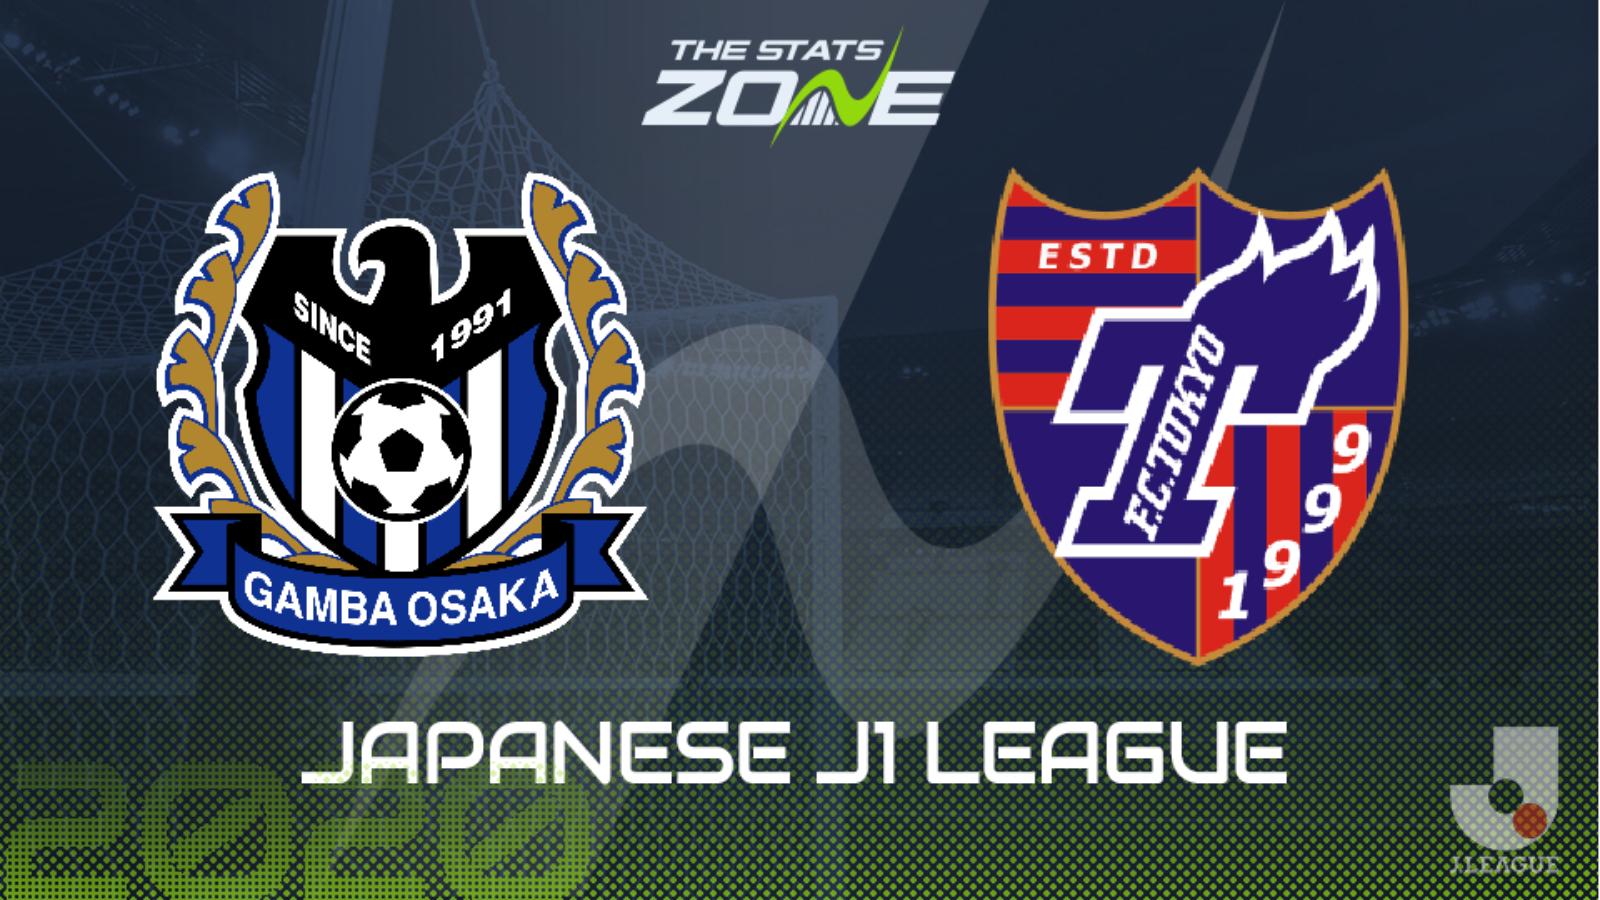 2020 Japanese J1 League Gamba Osaka Vs Fc Tokyo Preview Prediction The Stats Zone